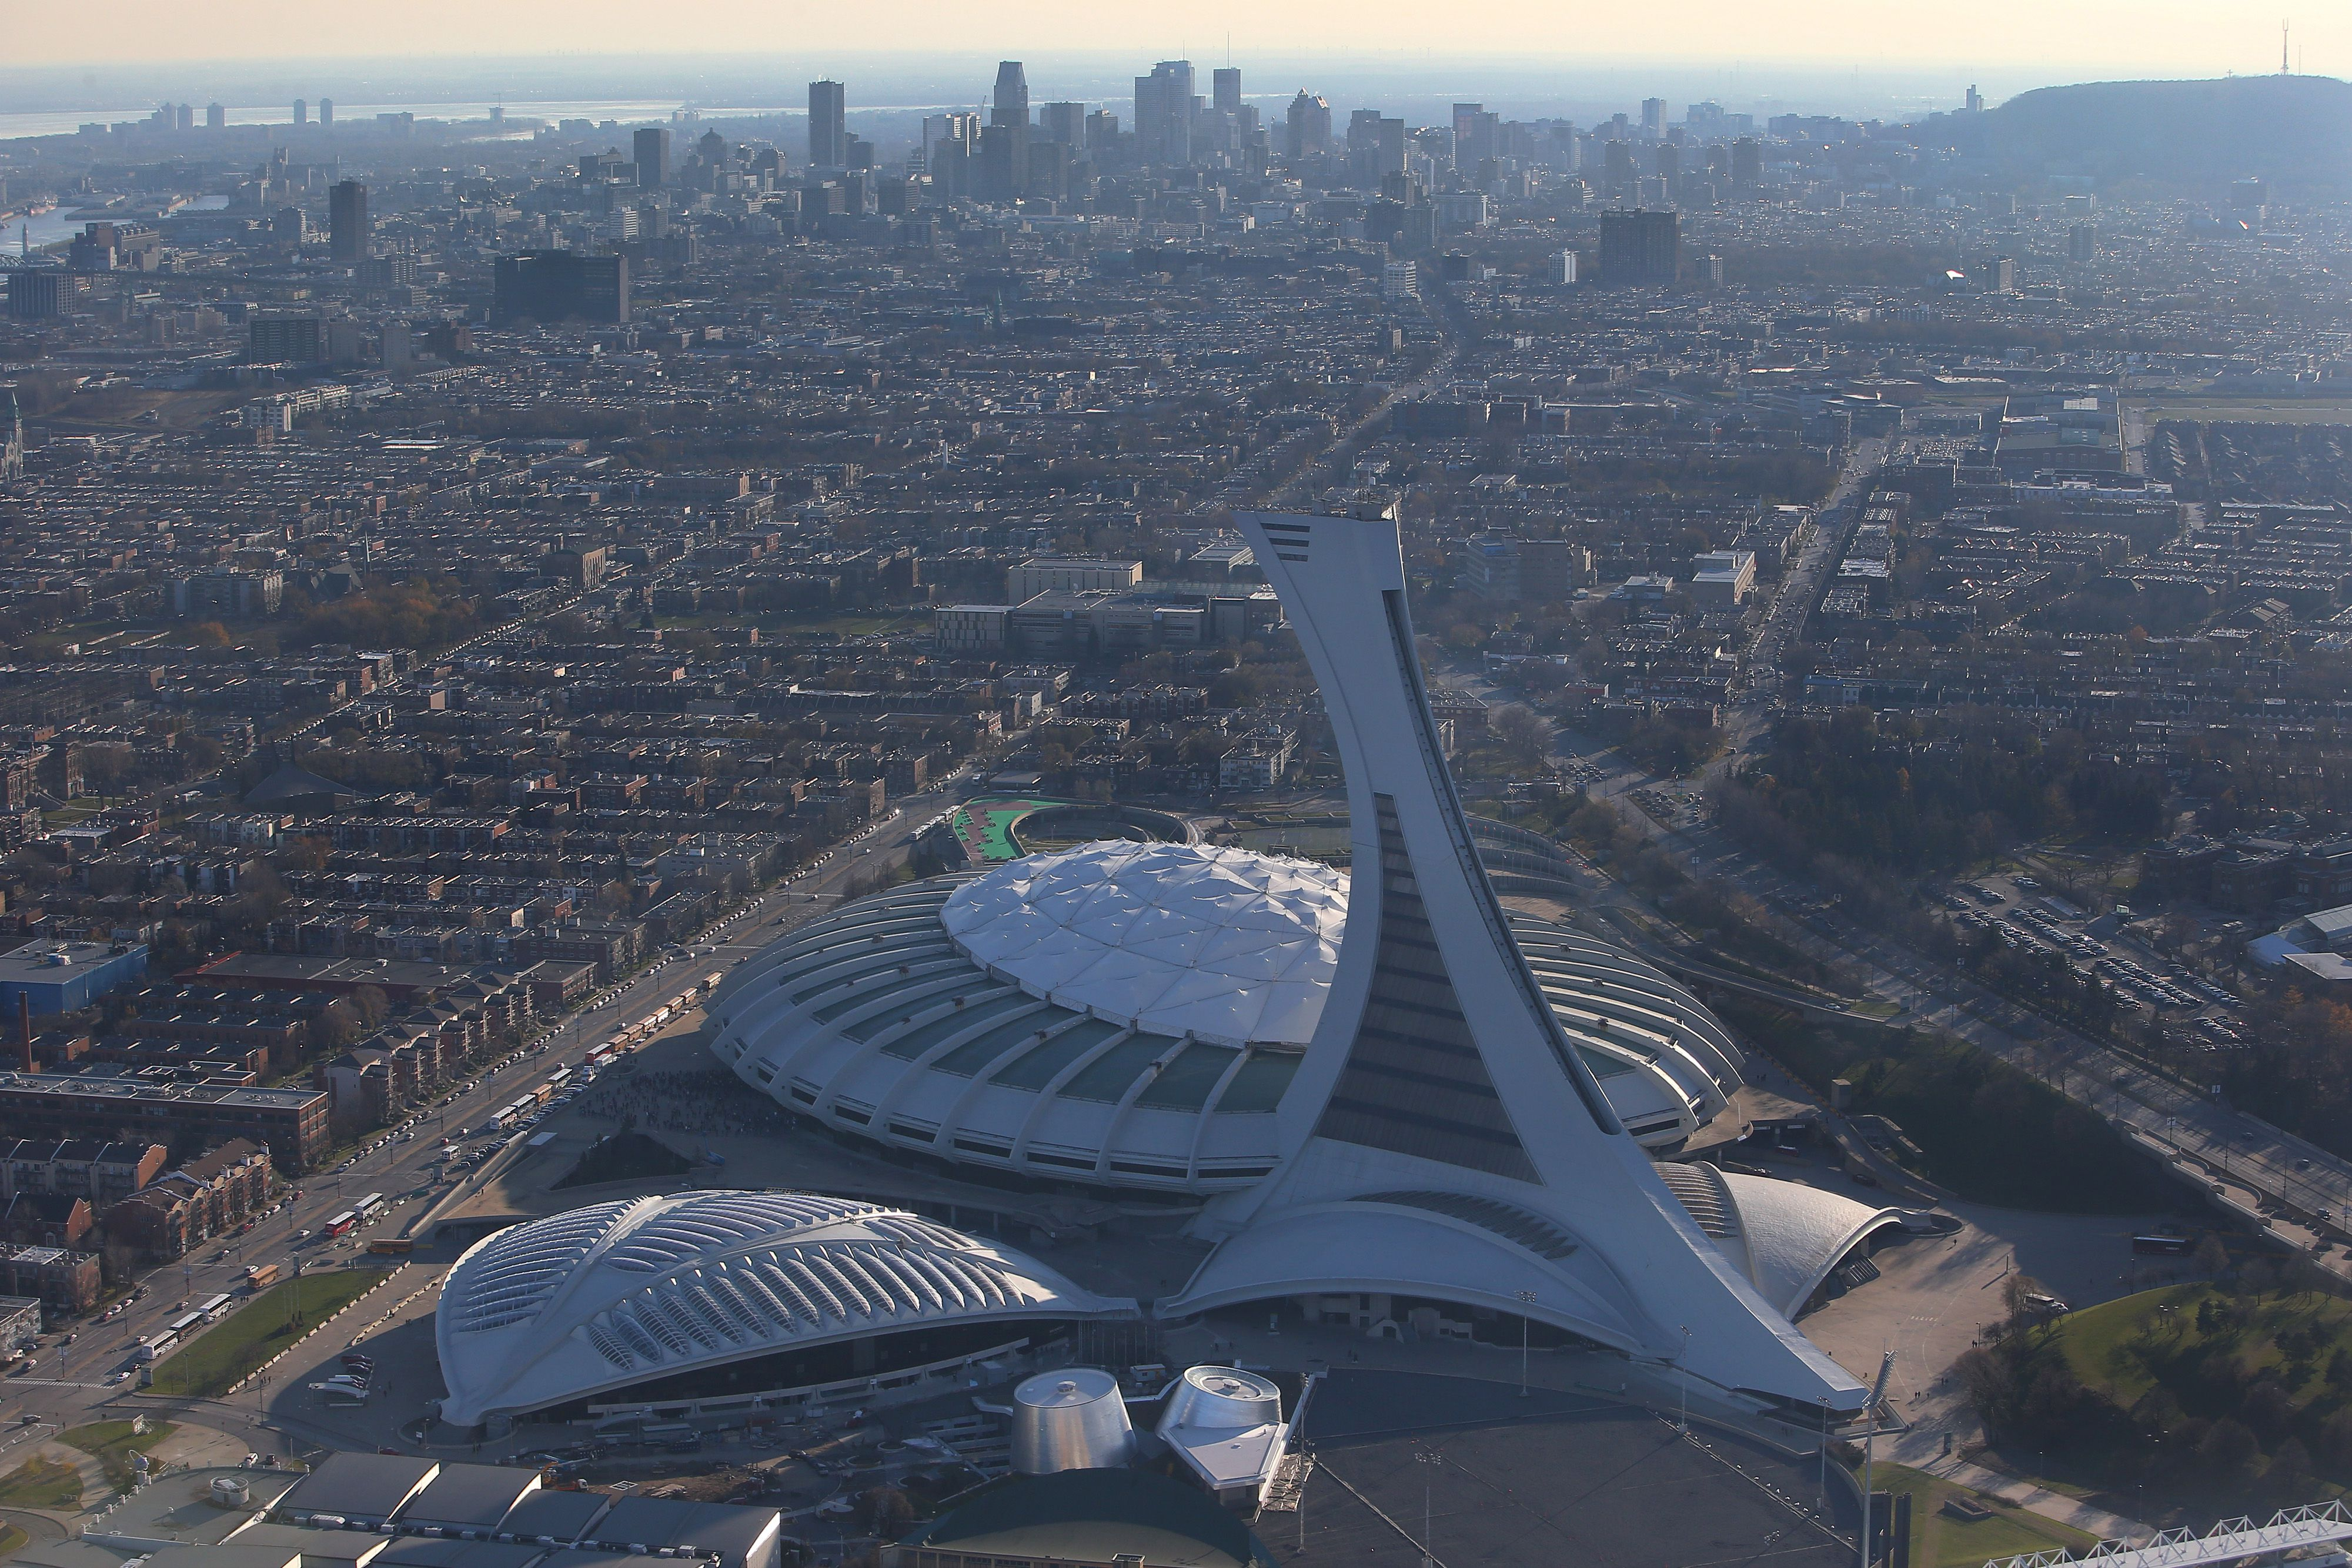 Olympic Stadium, Biodome, Saputo Stadium, and Olympic Park Montreal